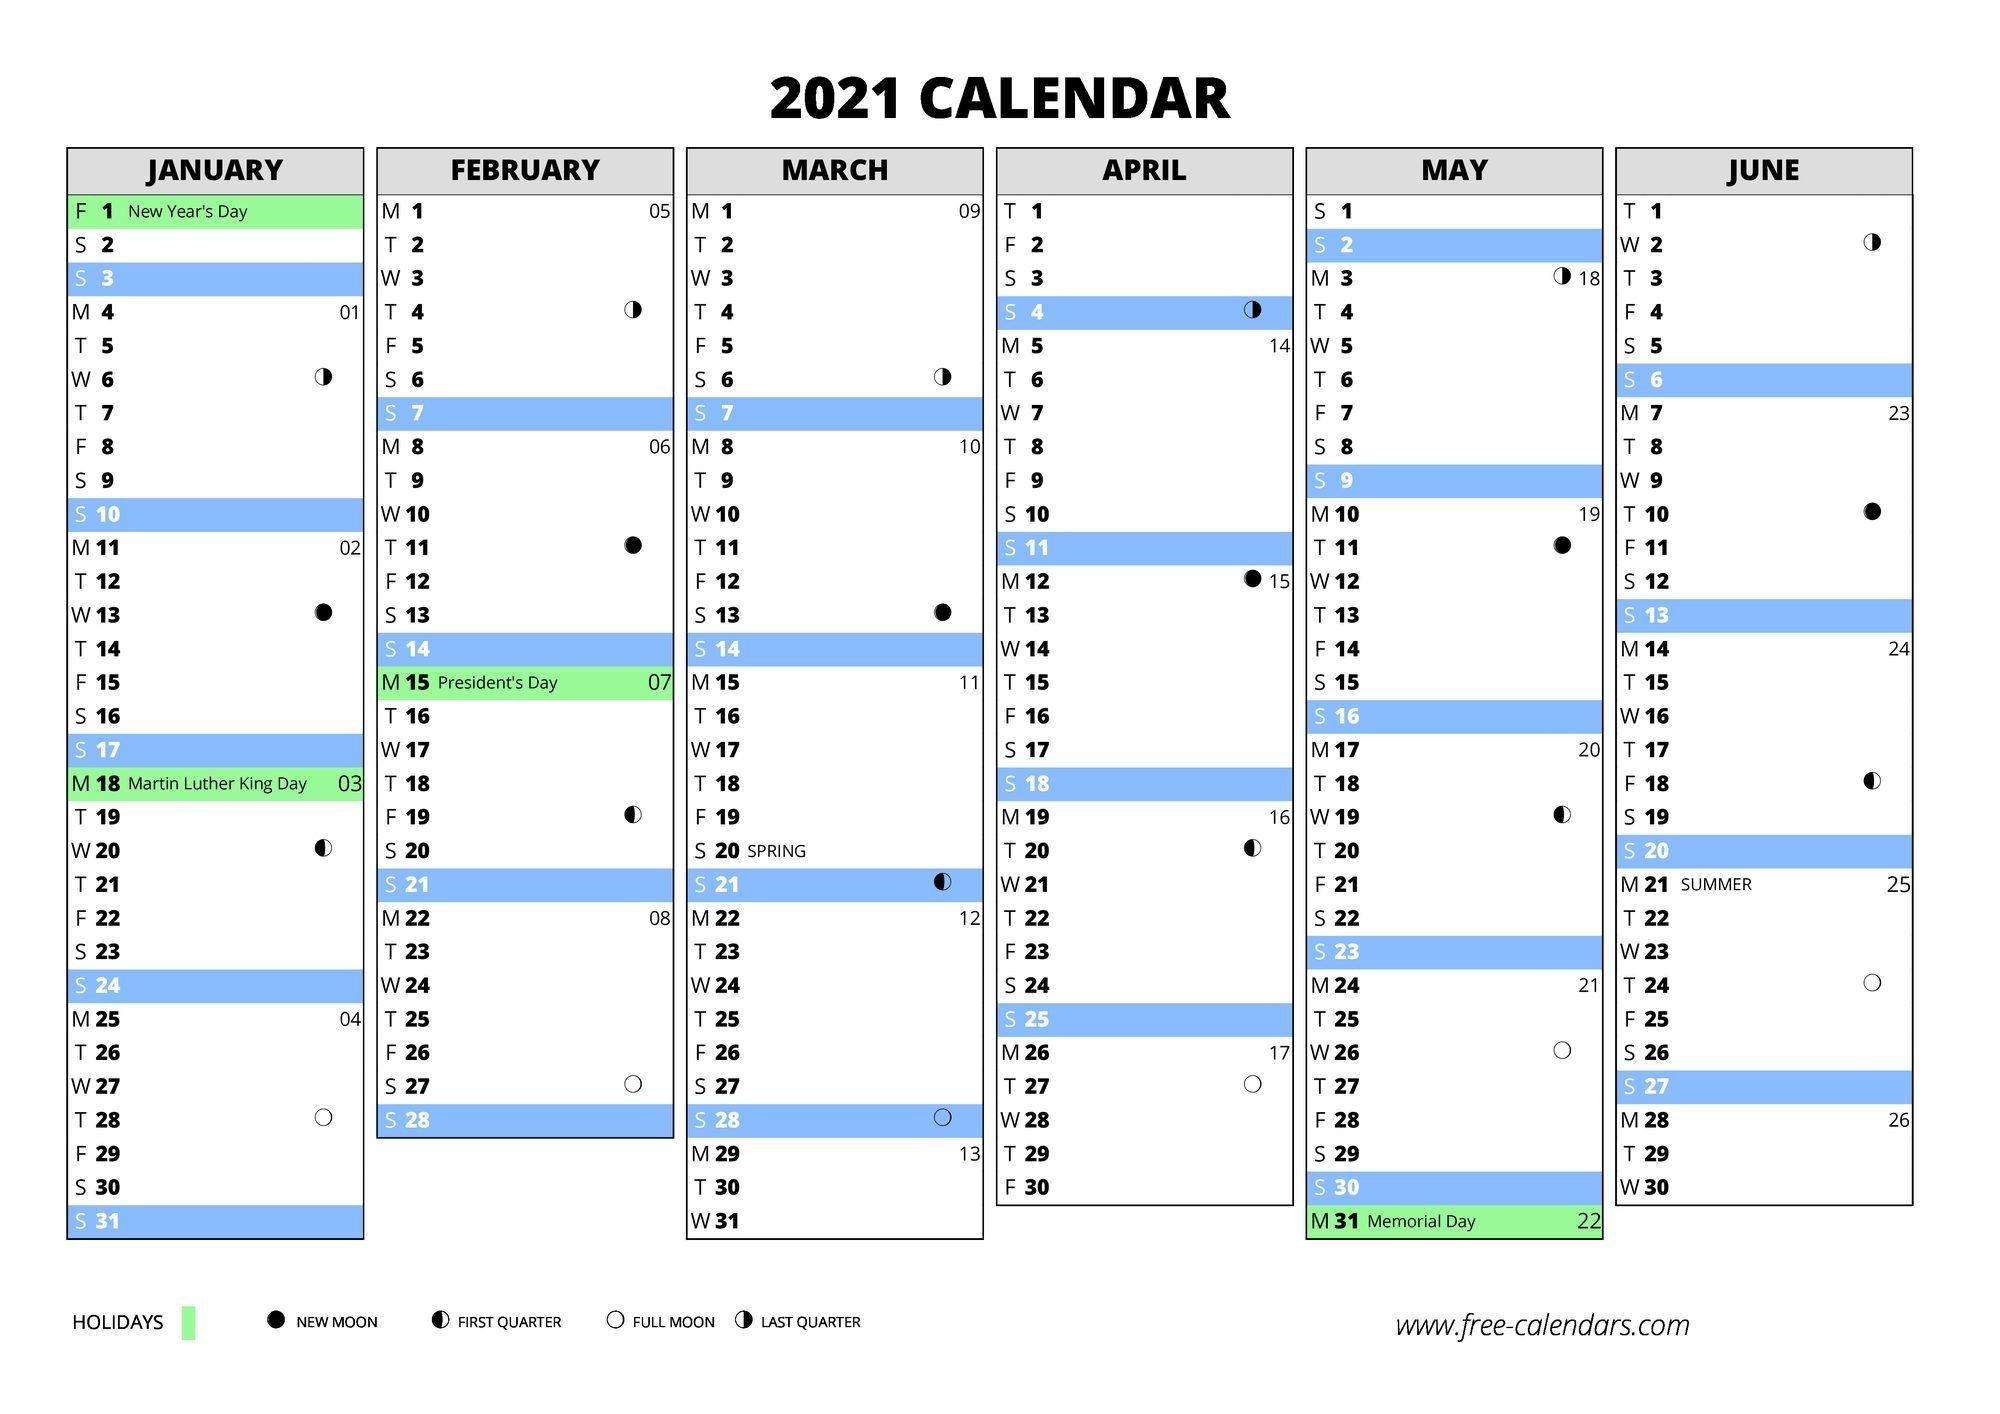 2021 calendar ≡ free calendars